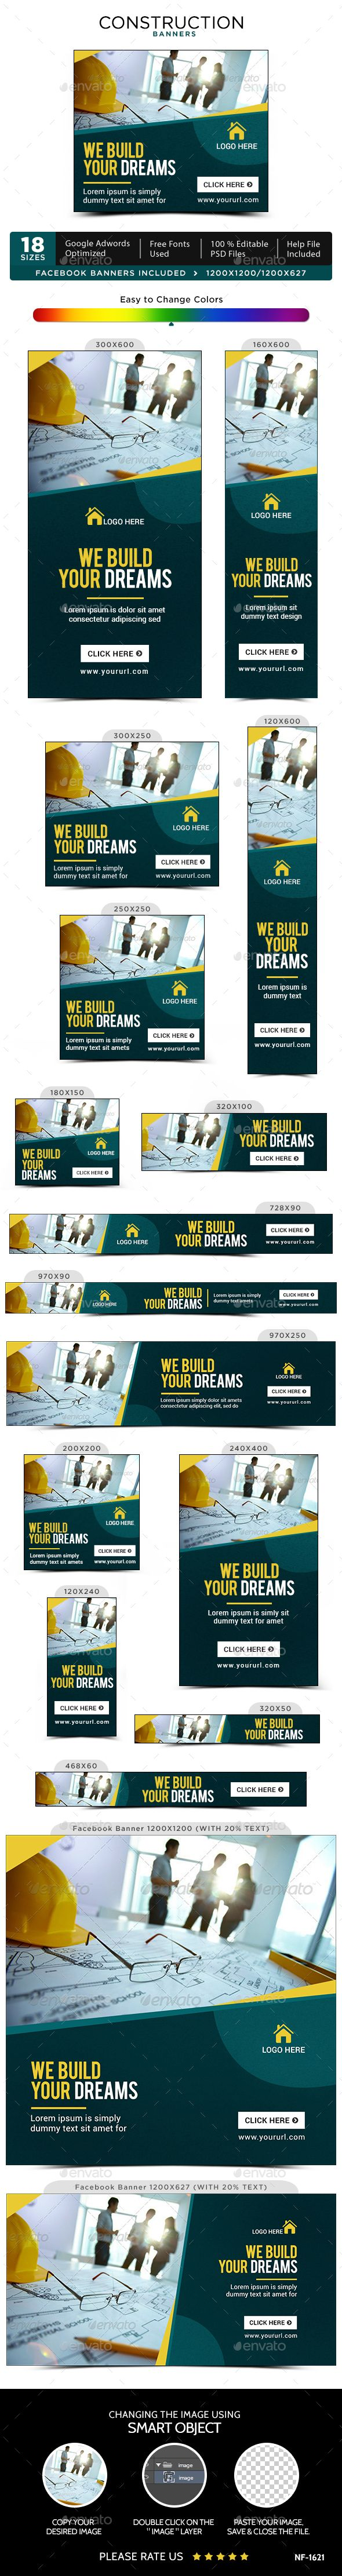 Construction Banner Template PSD #ads